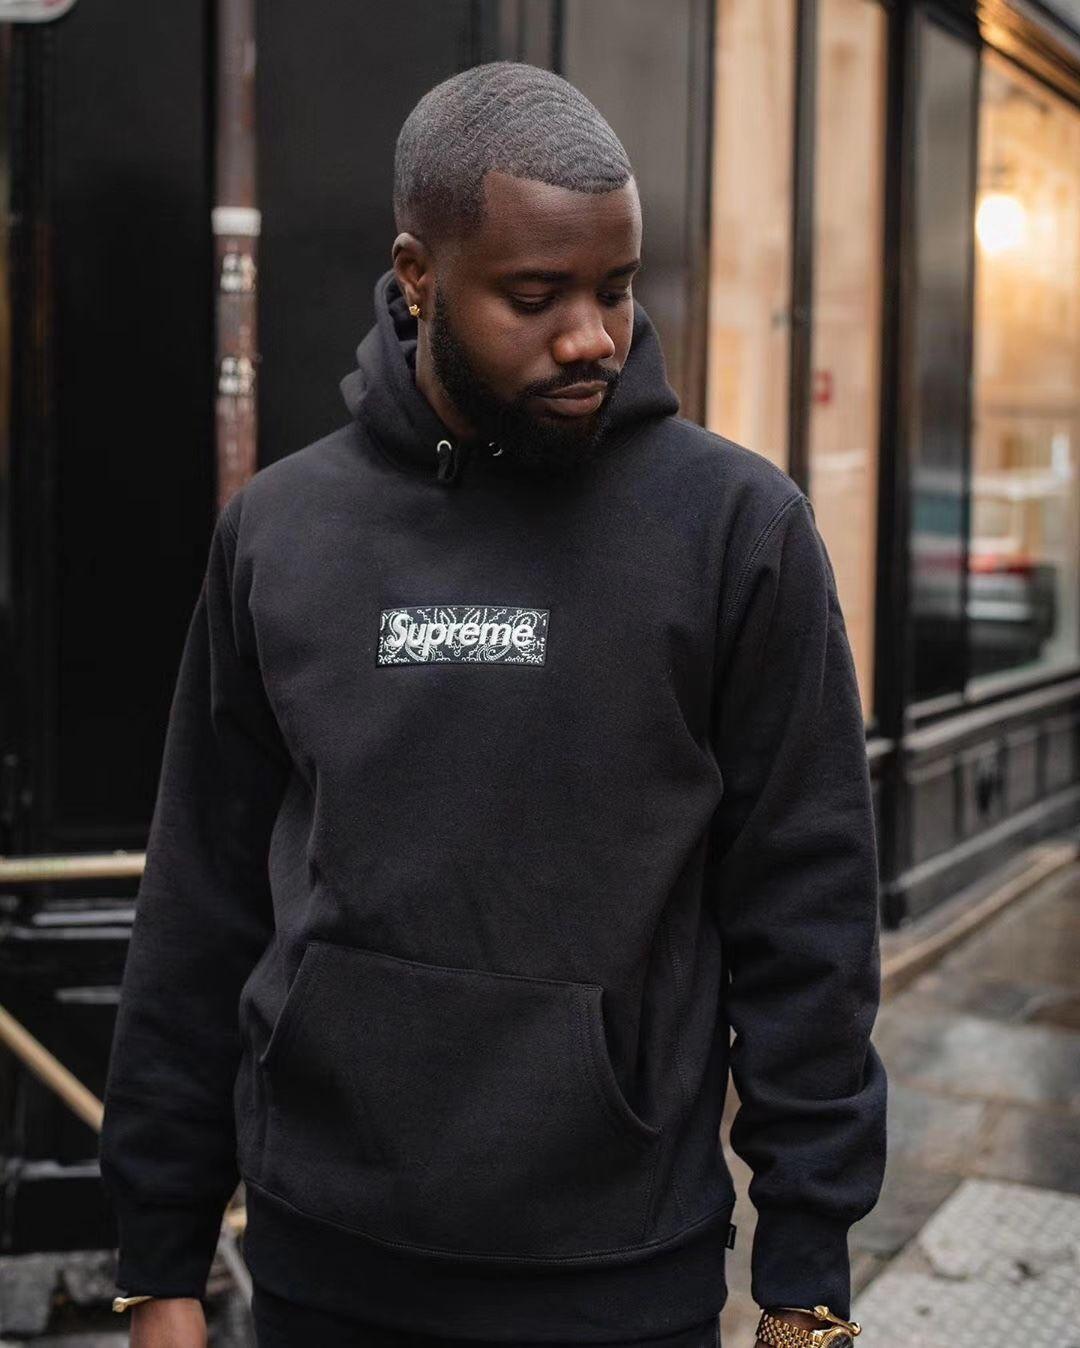 Supreme Bandana Box Logo Hooded Sweatshirt Black It Is Specifically Designed To Celebrate Supreme S 25th Anni Hot Hoodies Streetwear Sale Hooded Sweatshirts [ 1348 x 1080 Pixel ]